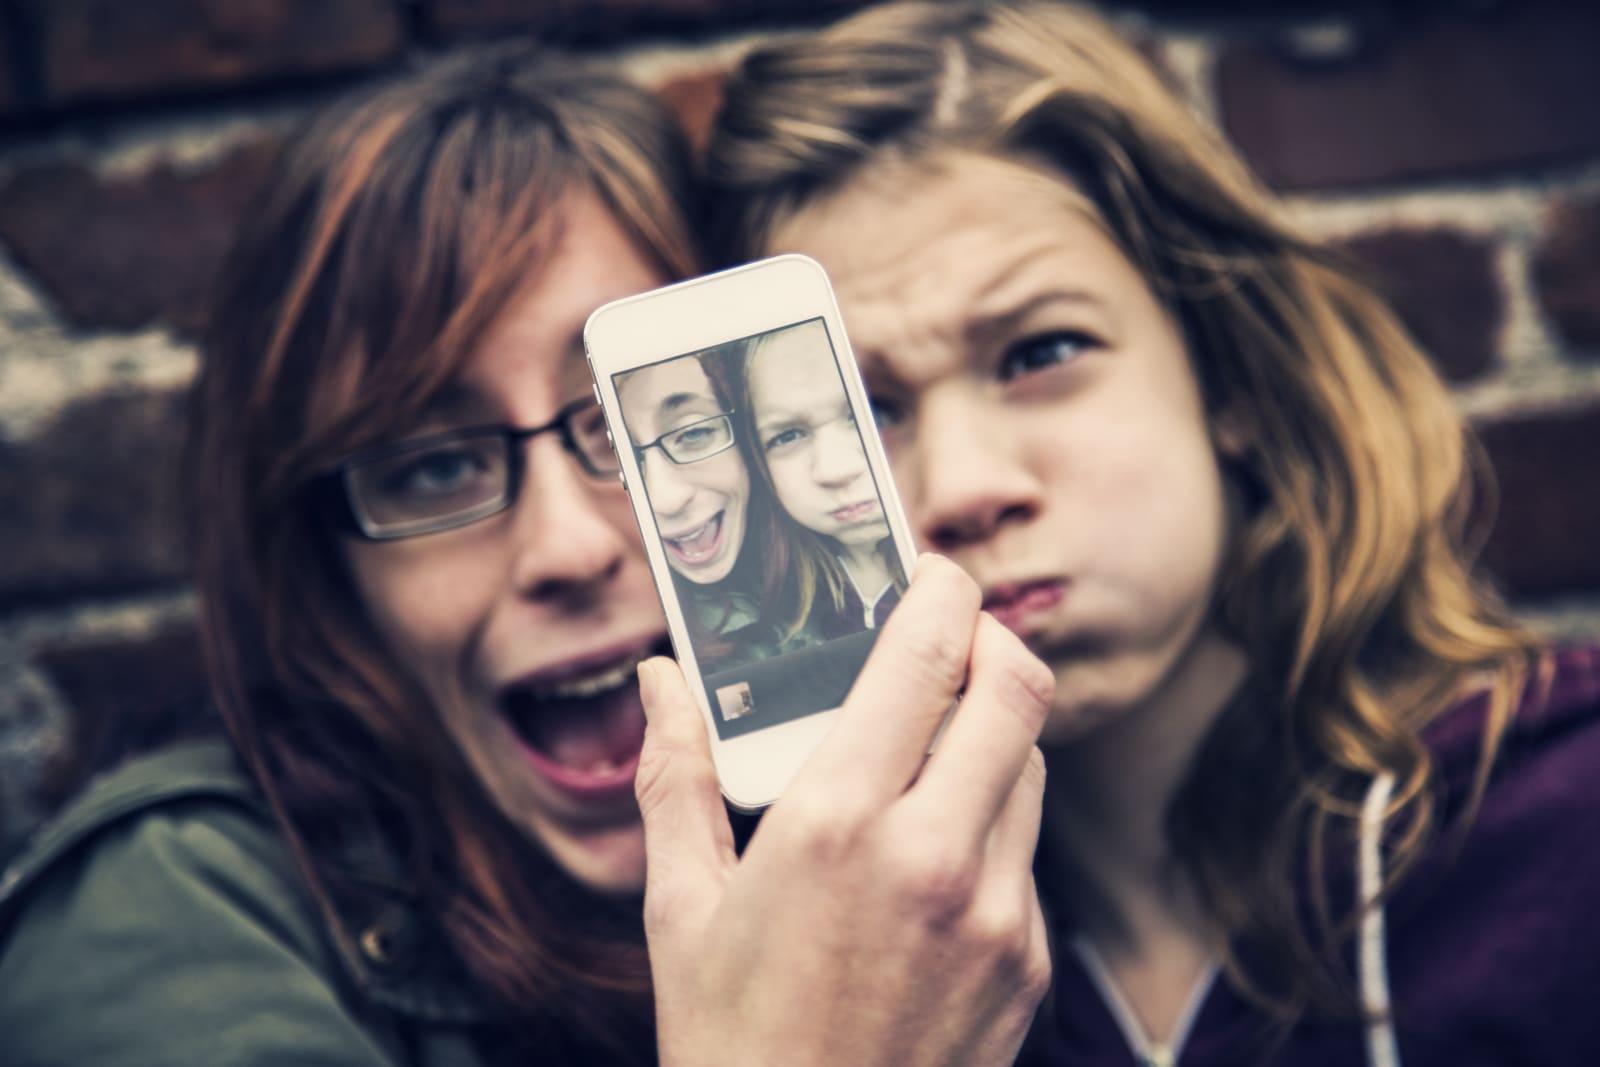 HSBC's 'selfie verification' helps customers open a bank account